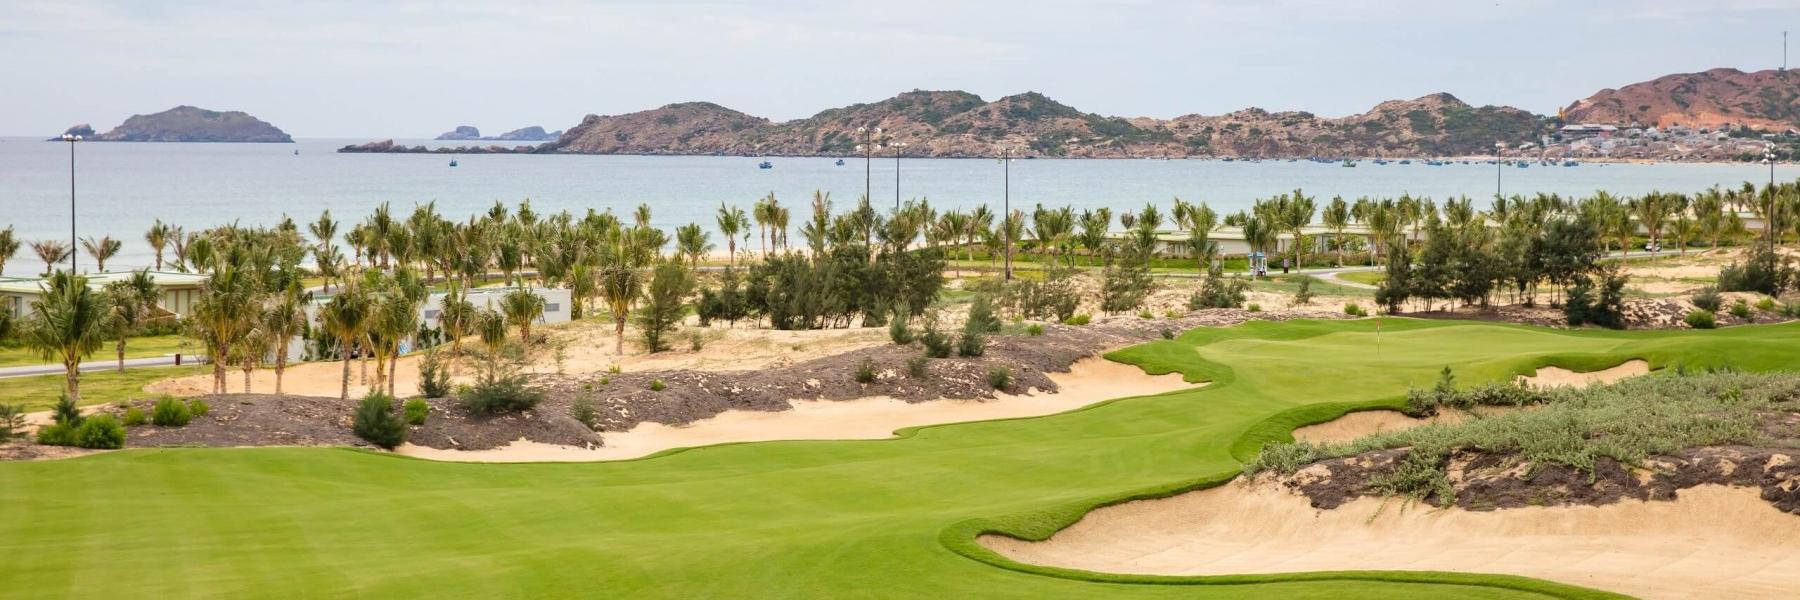 9 Golf Holidays in Vietnam: 4. Golf in Quy Nhon